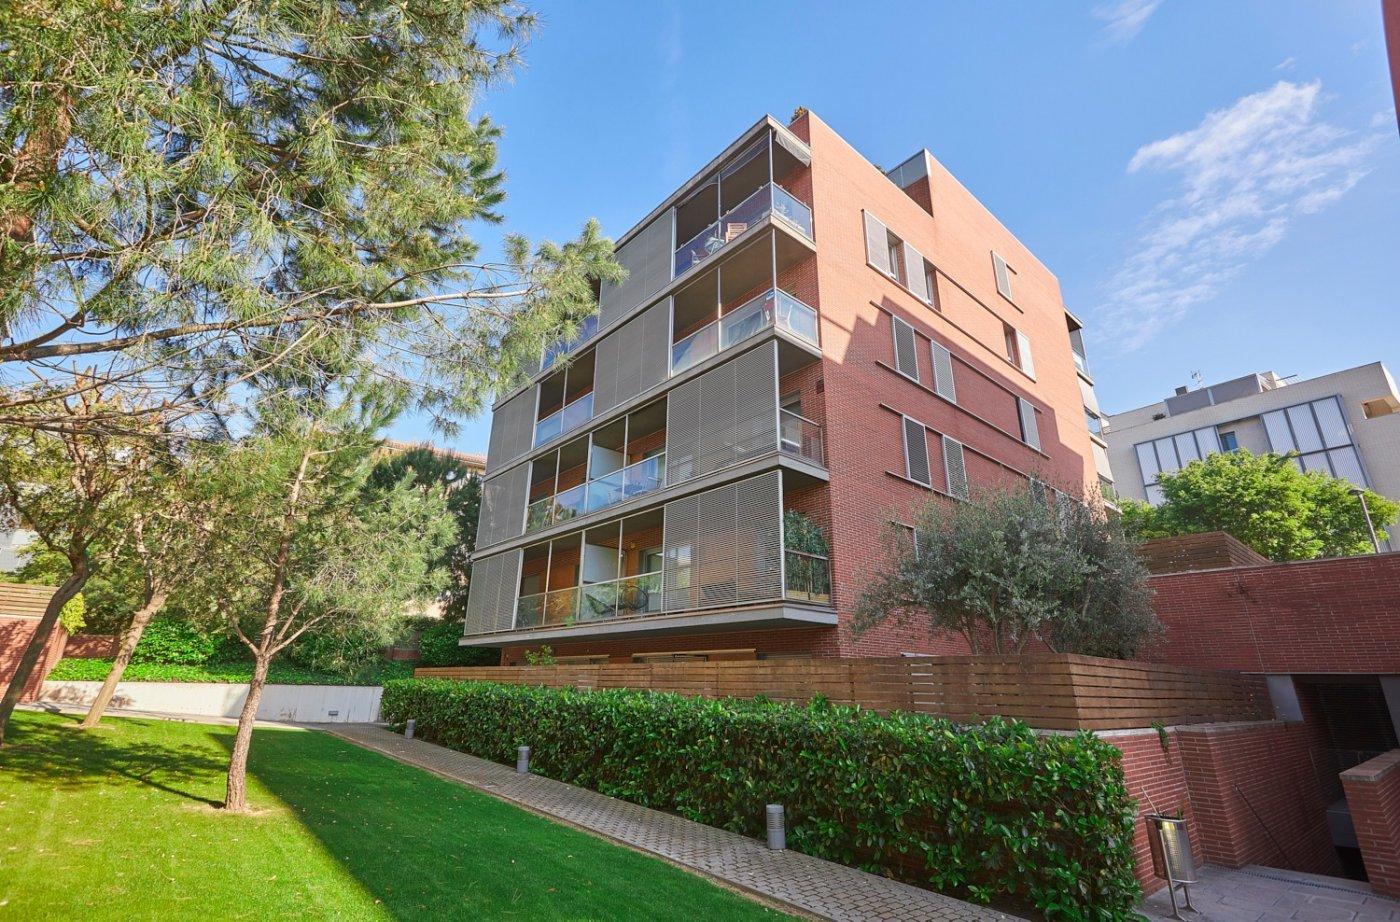 Flat for sale in Volpelleres, Sant Cugat del Valles